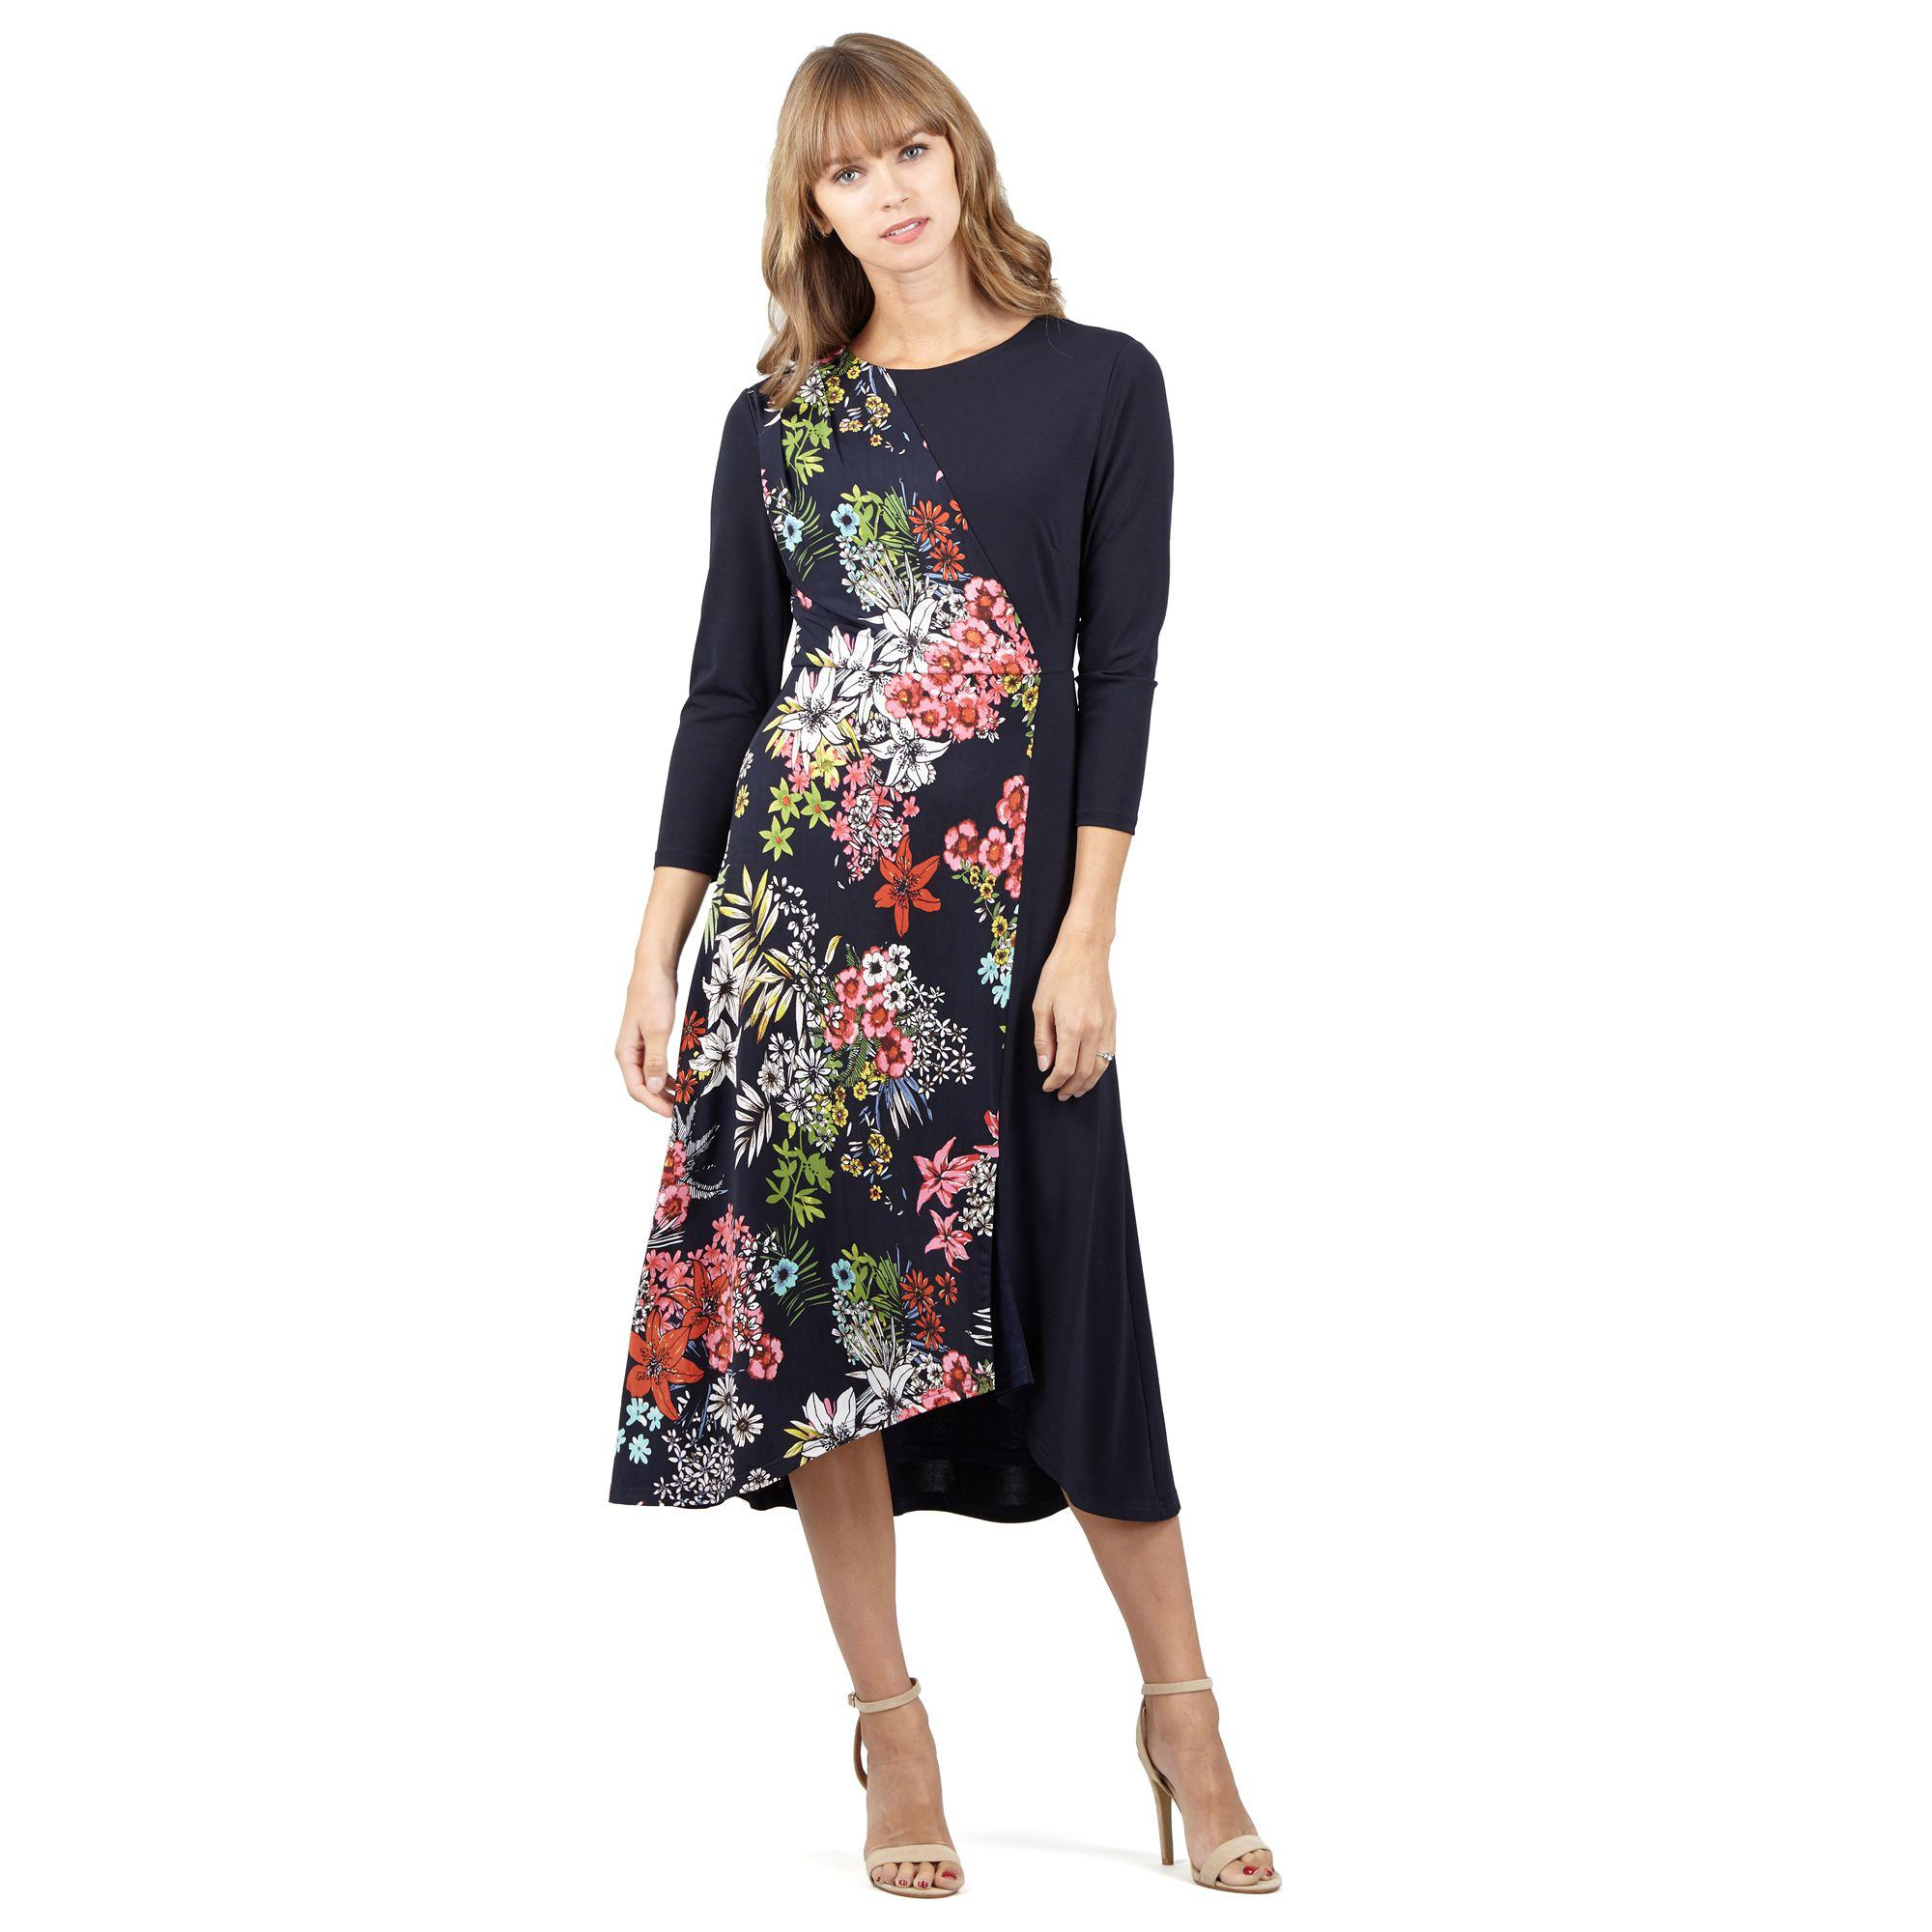 be91182191876 Izabel London Navy Floral Print Midi Dress in Blue - Lyst